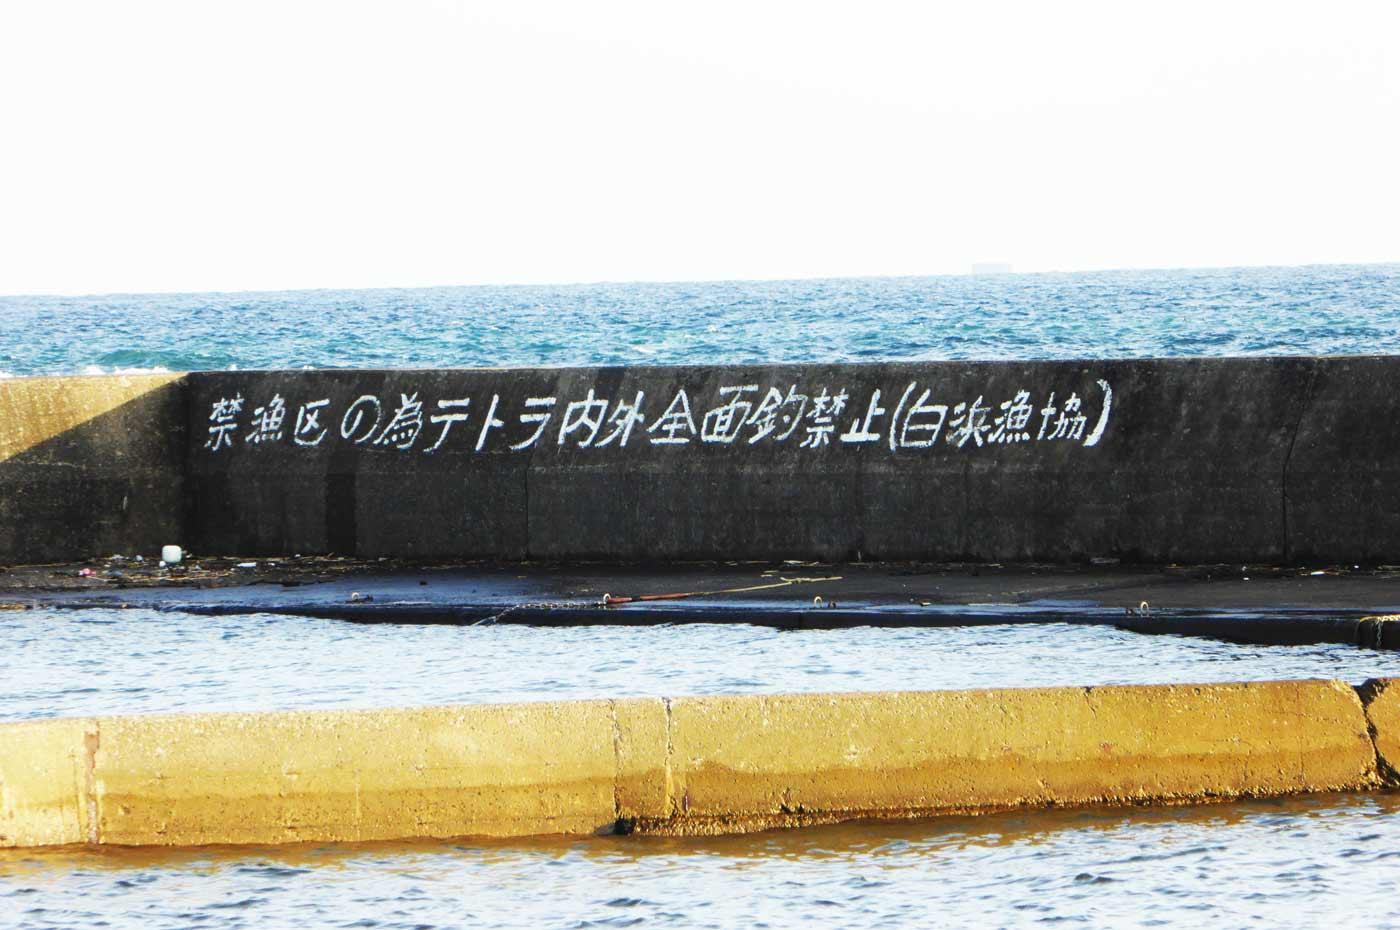 根本港左側堤防の画像